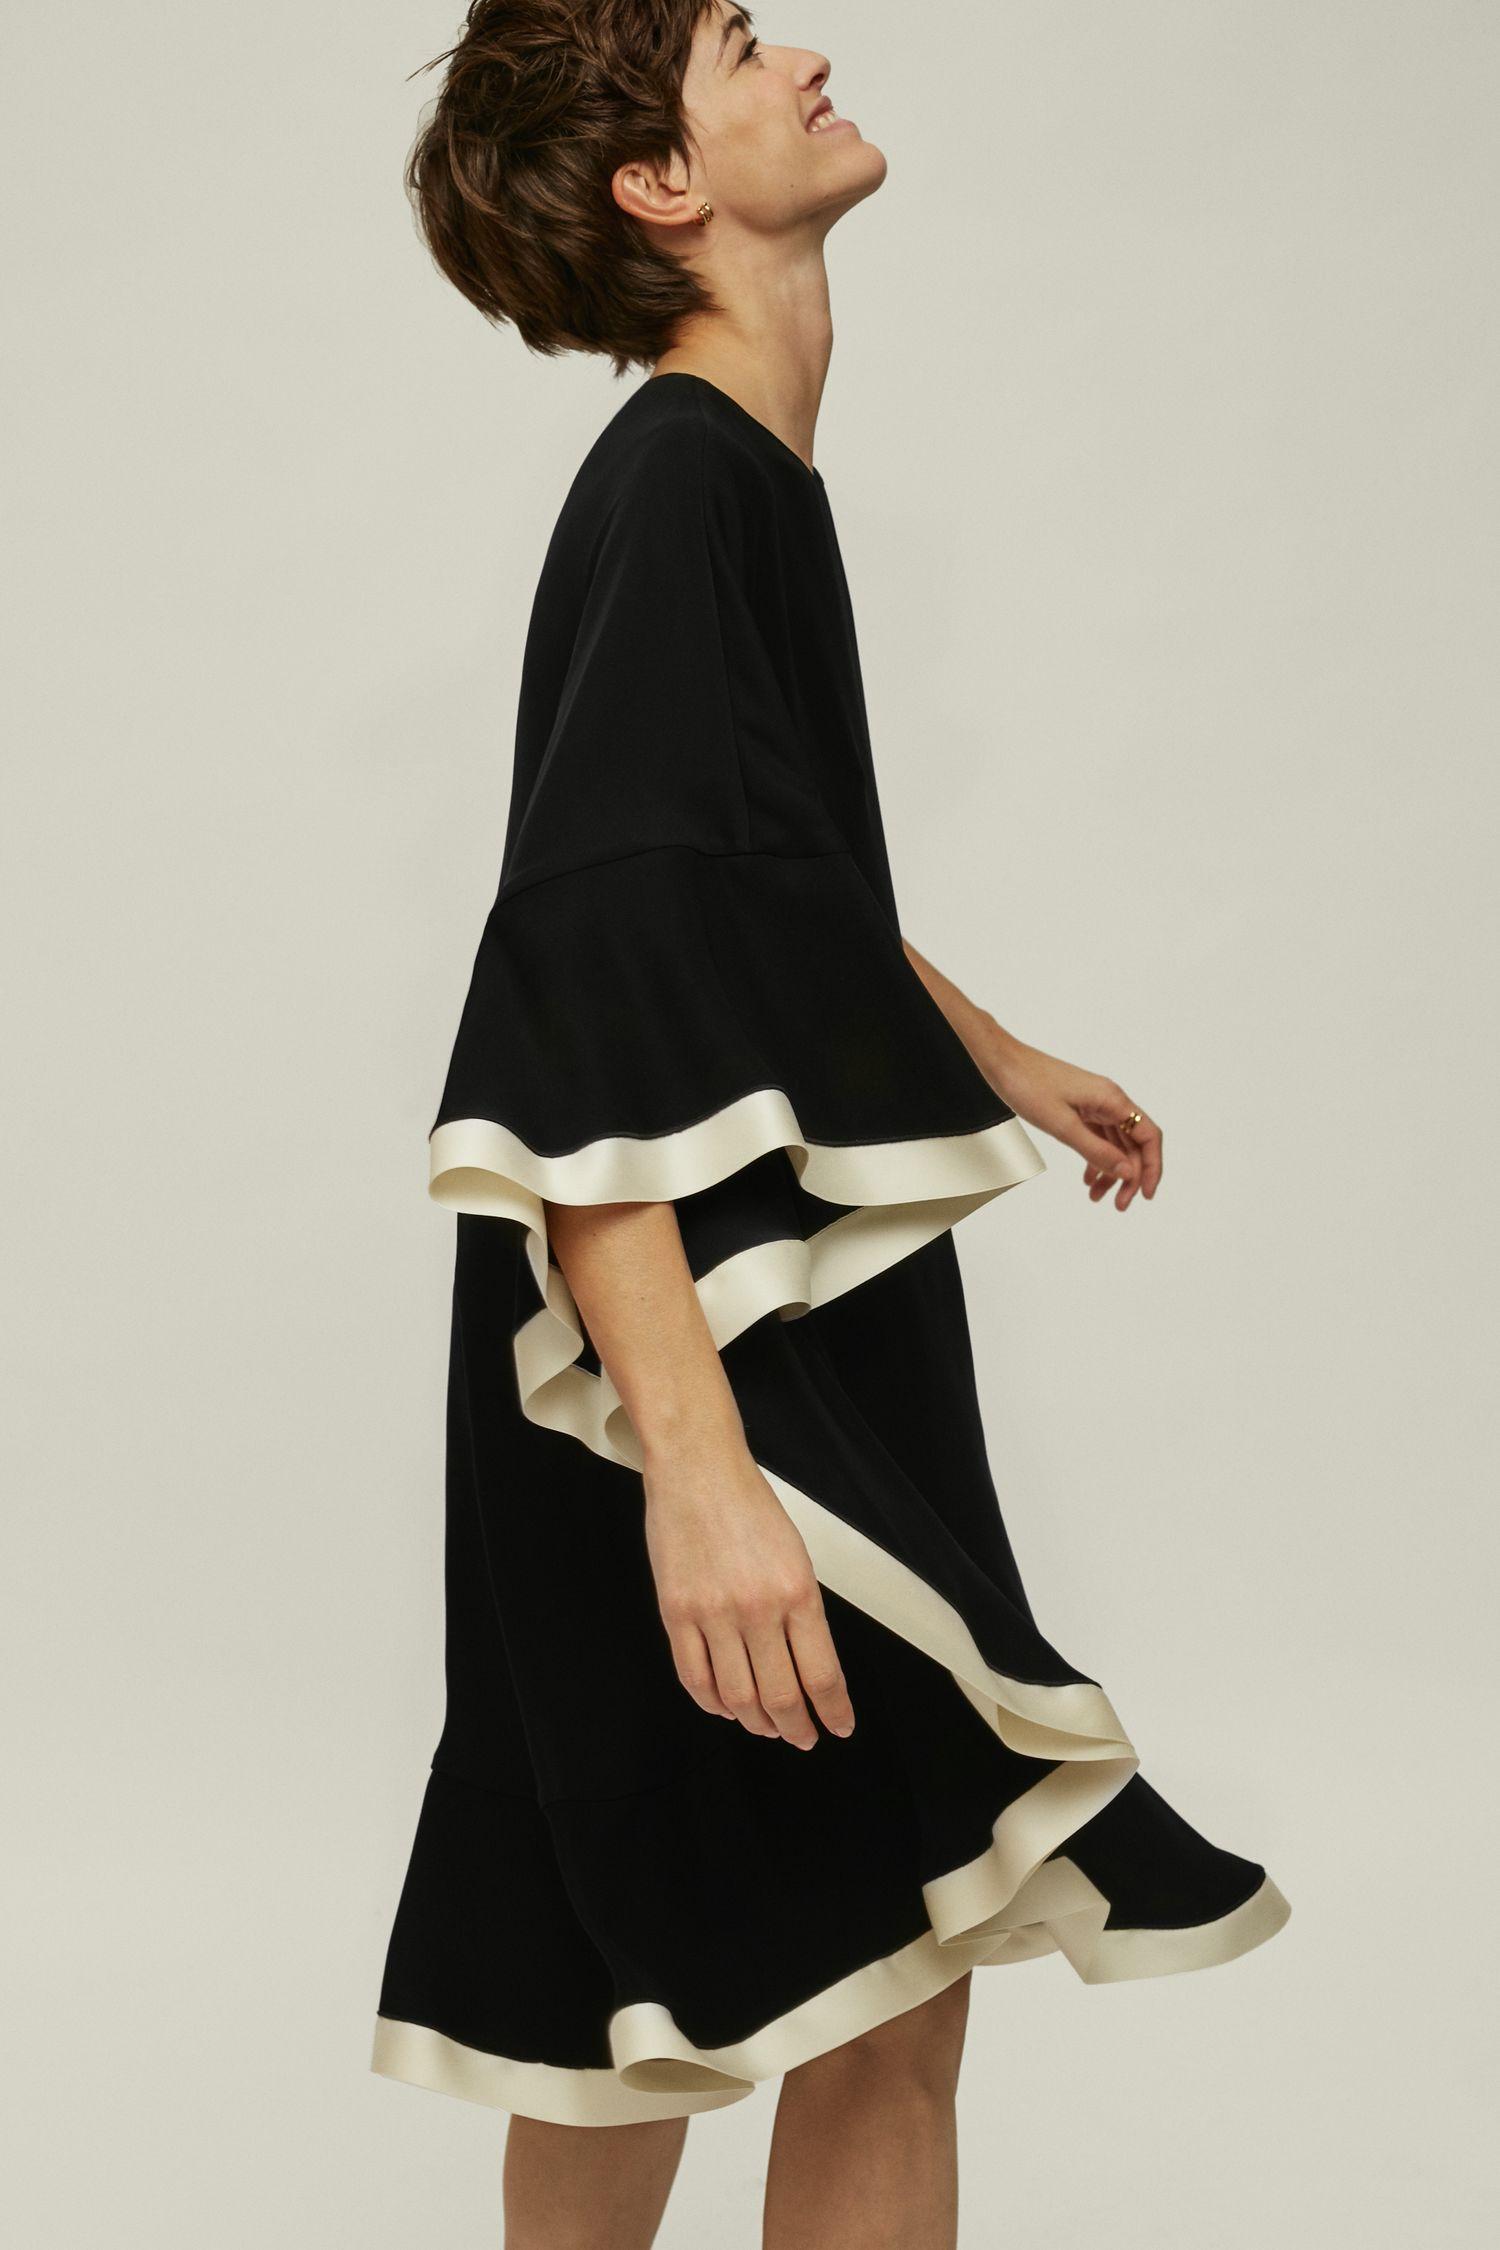 Asymmetric A-line dress